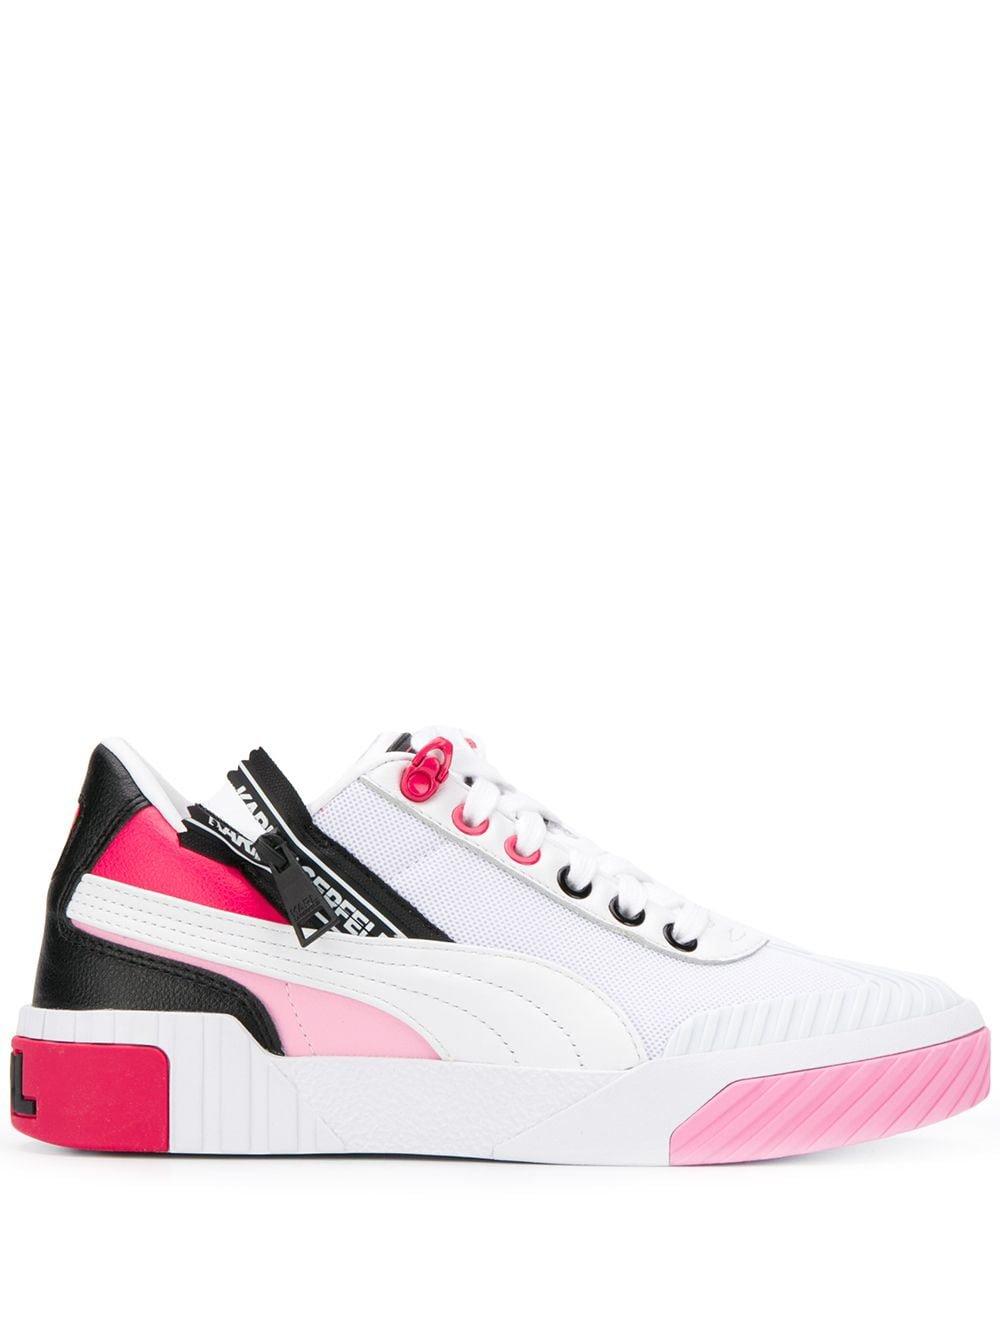 Puma Baskets Cali Puma x Karl Lagerfeld - Farfetch